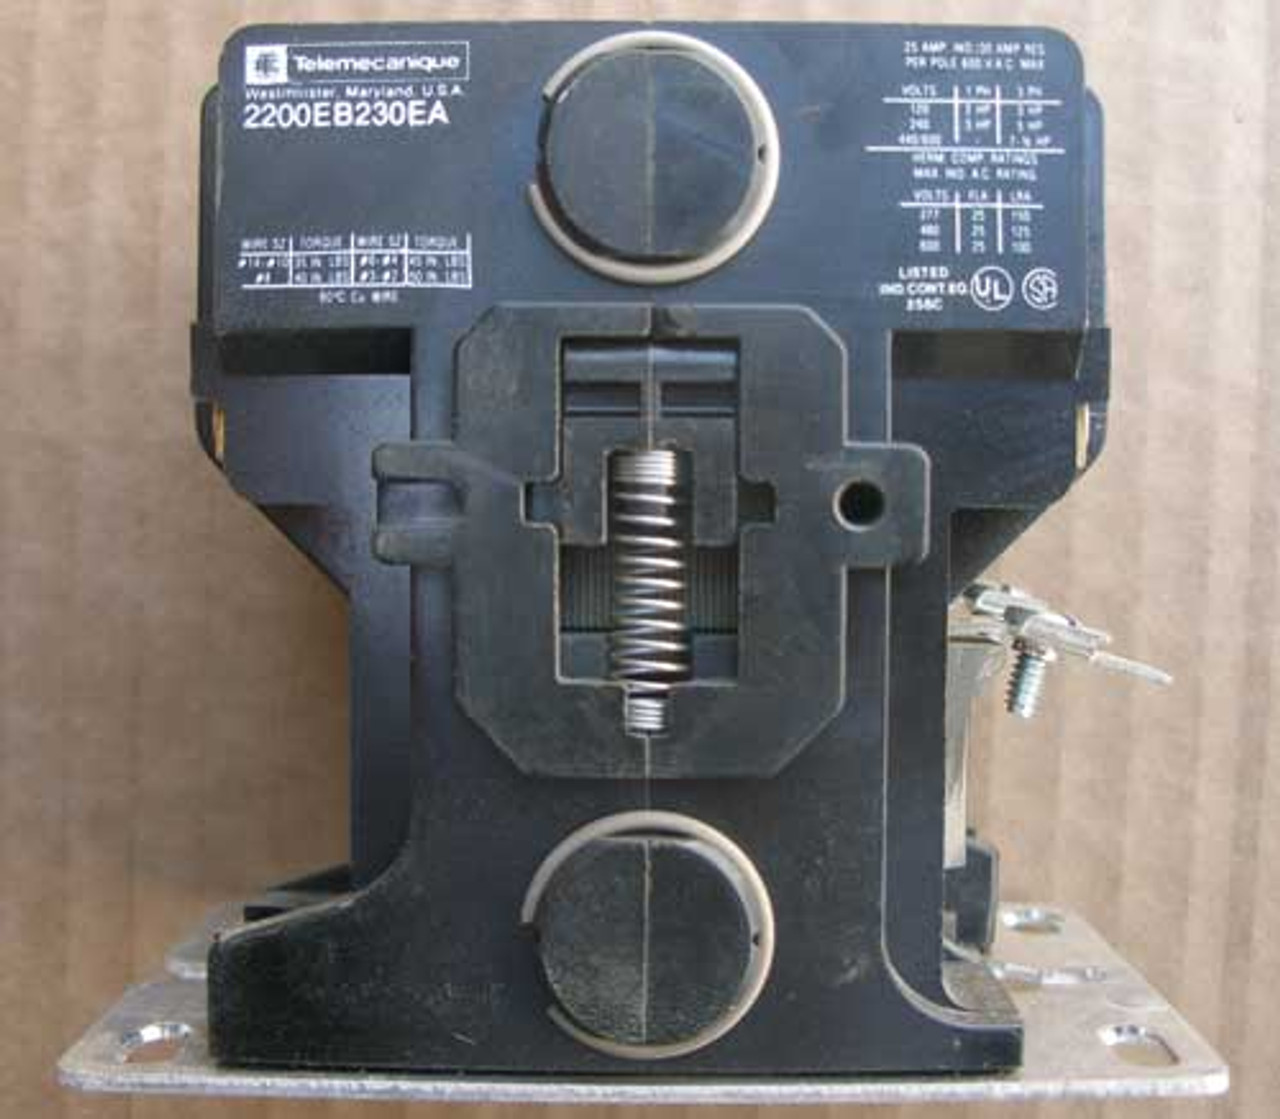 Telemecanique 2200EB230EA 3P 25A 600V Def Purpose Contactor Open - Used